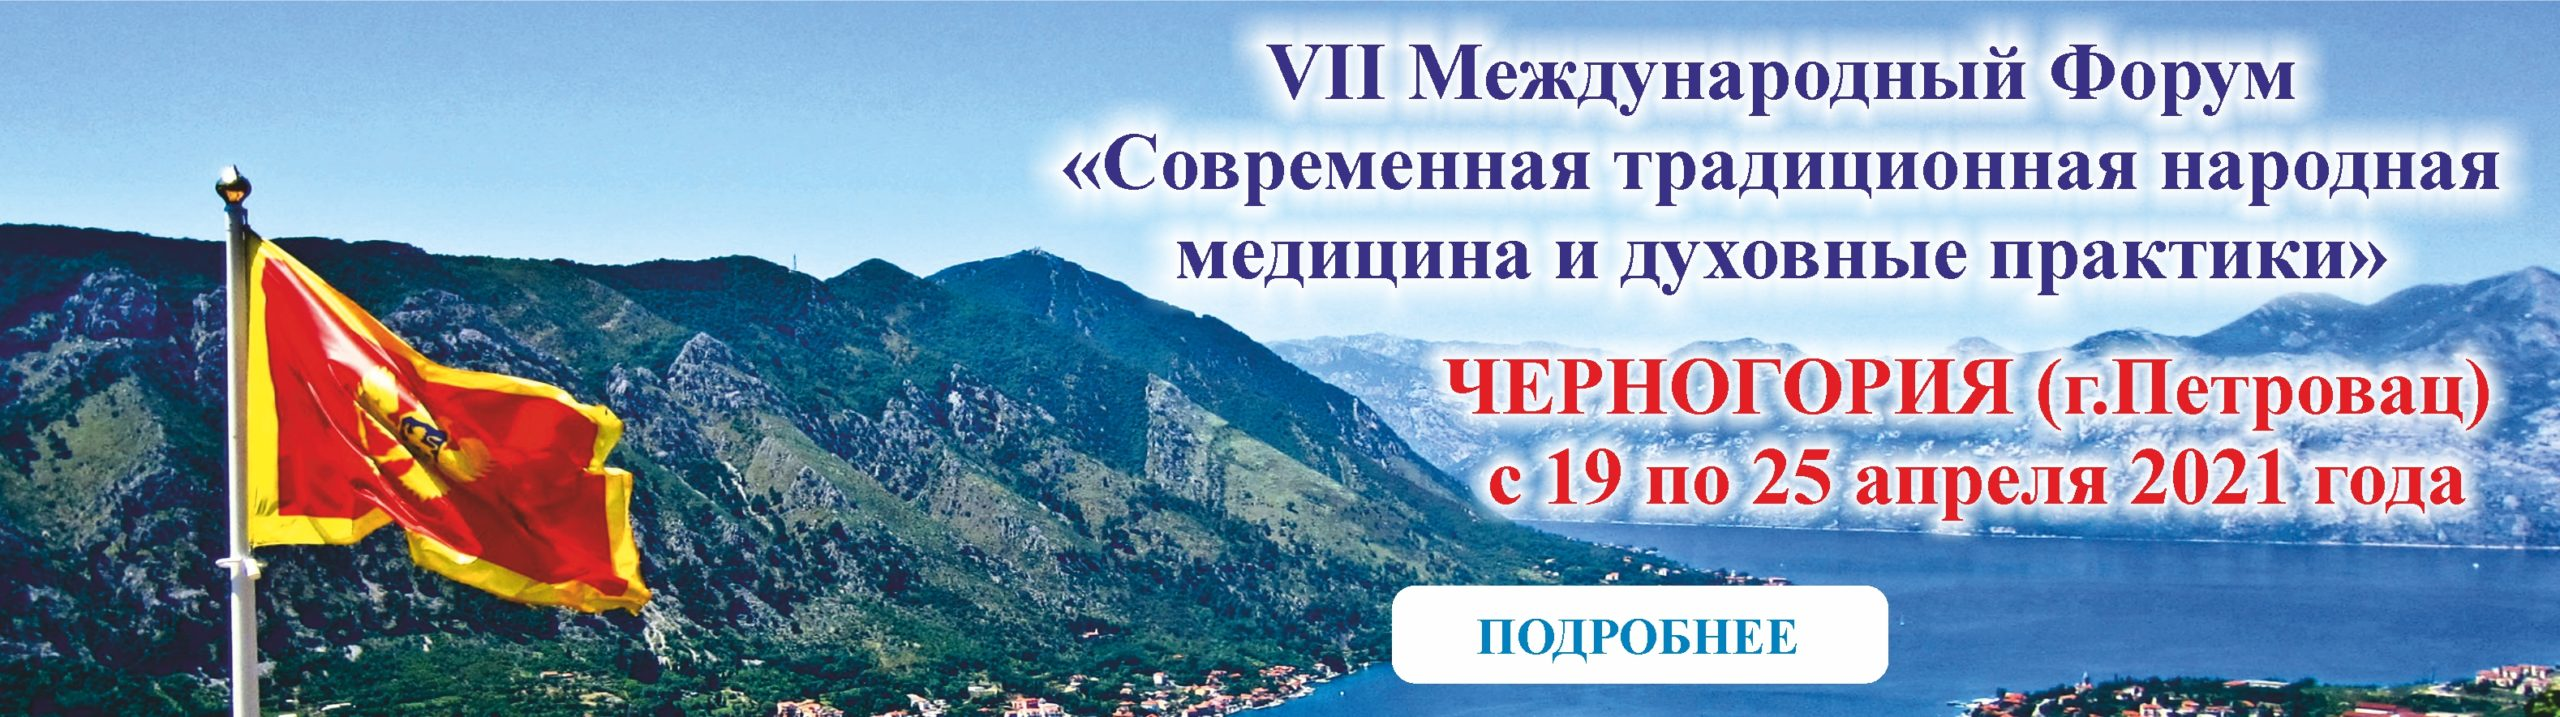 Сайта Черногория scaled - Для Сайта Черногория